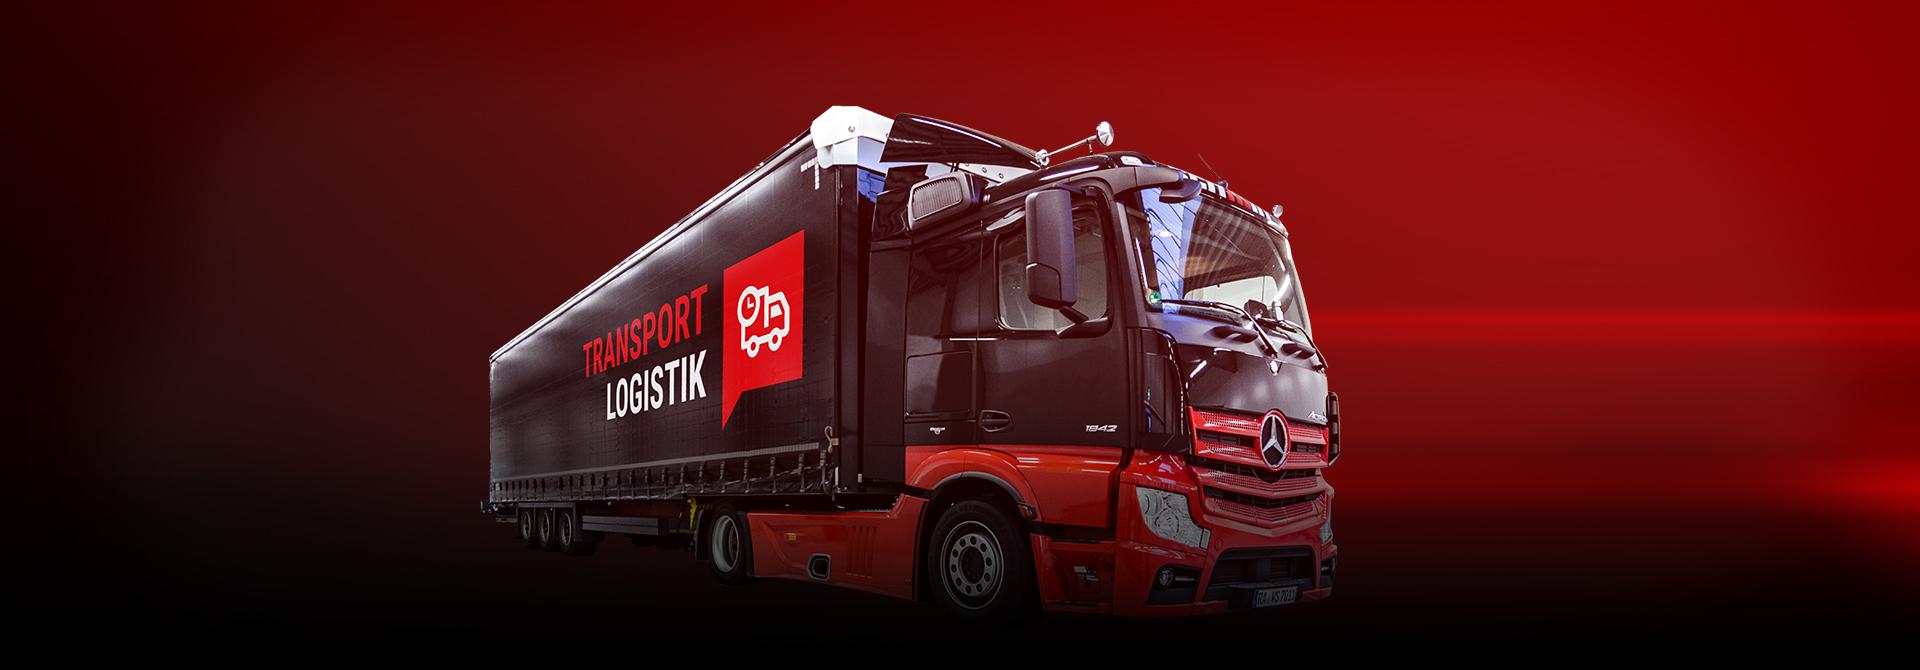 Logistik Schmitt- Werden Sie unser Transport-Partner